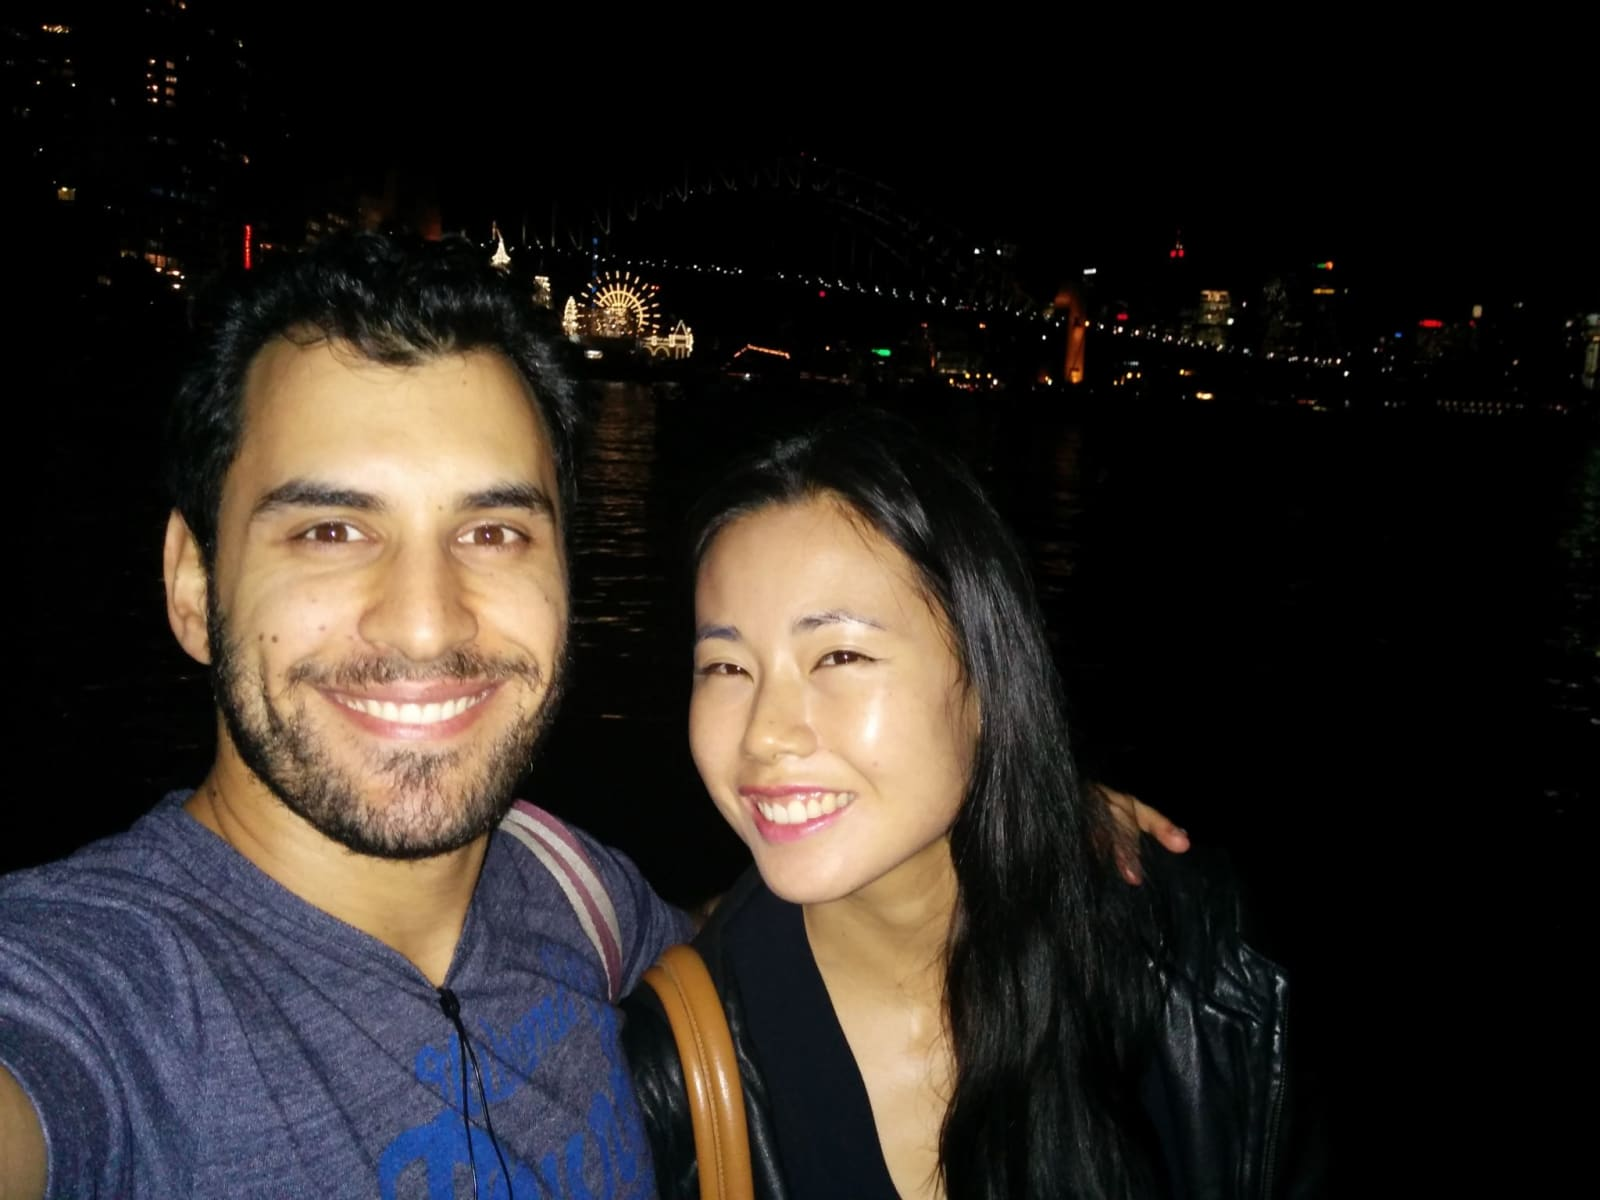 Adrian & Sarah from Sydney, New South Wales, Australia